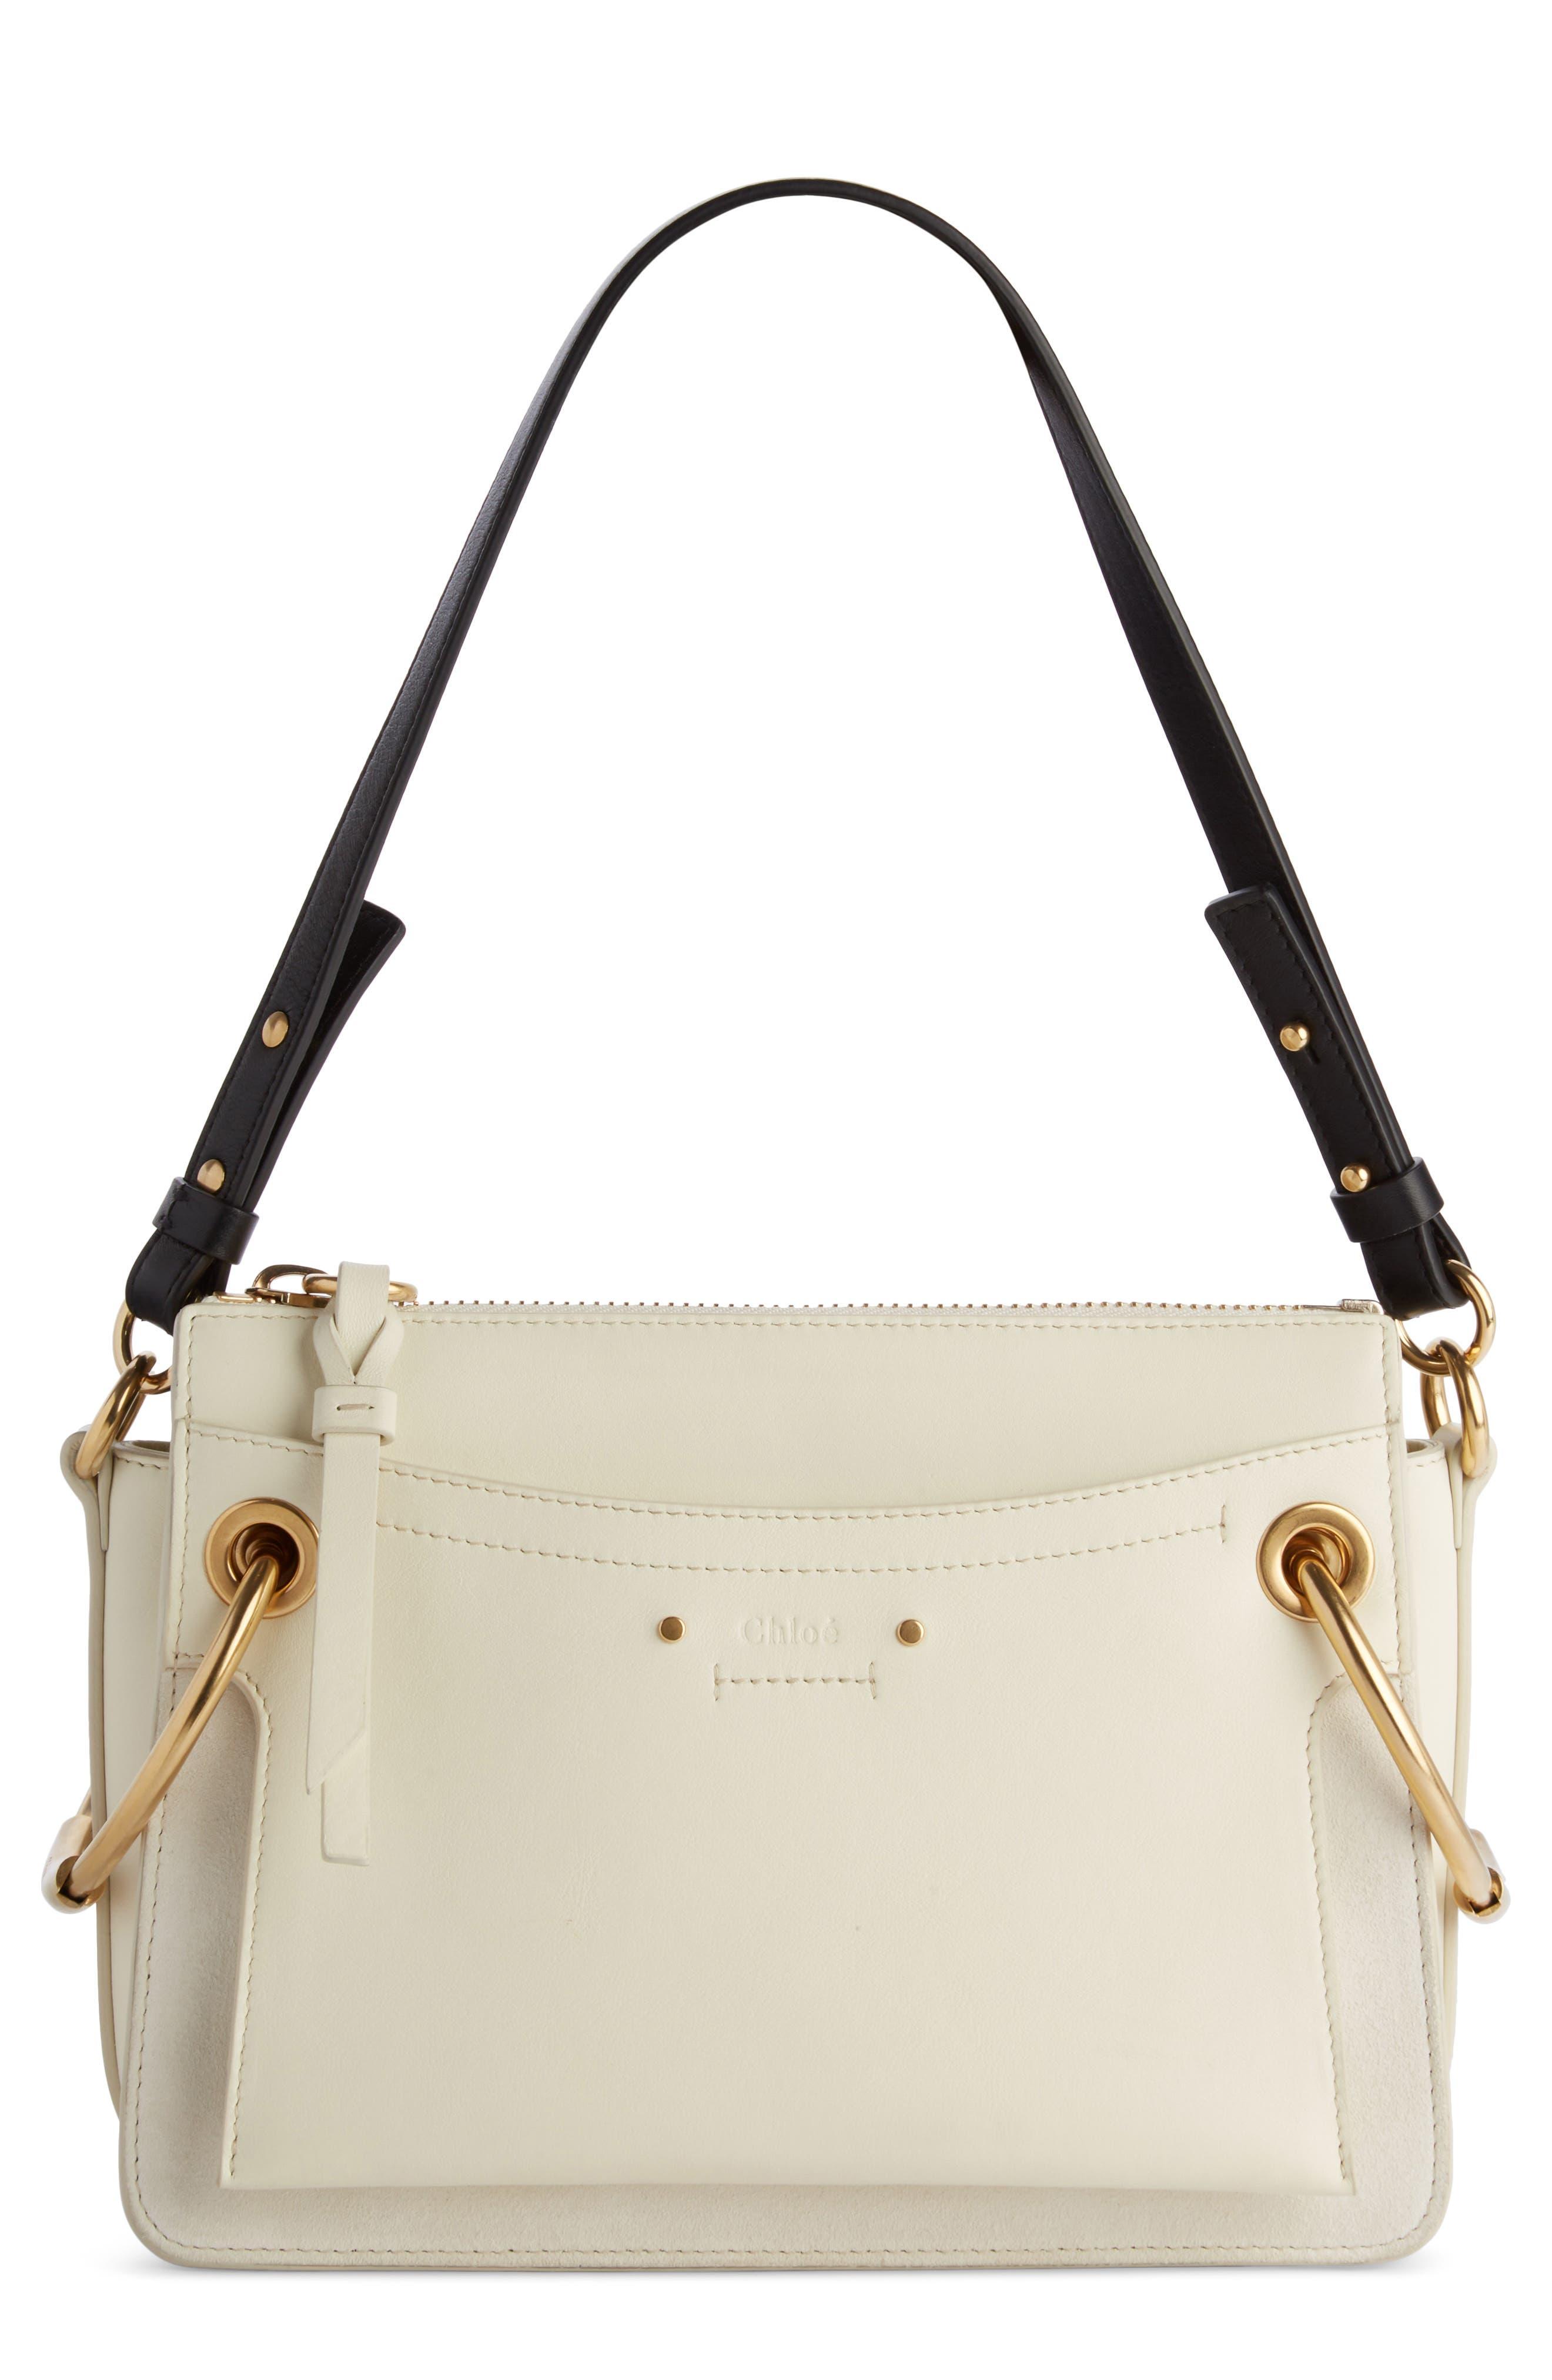 Chloé Small Roy Leather Shoulder Bag